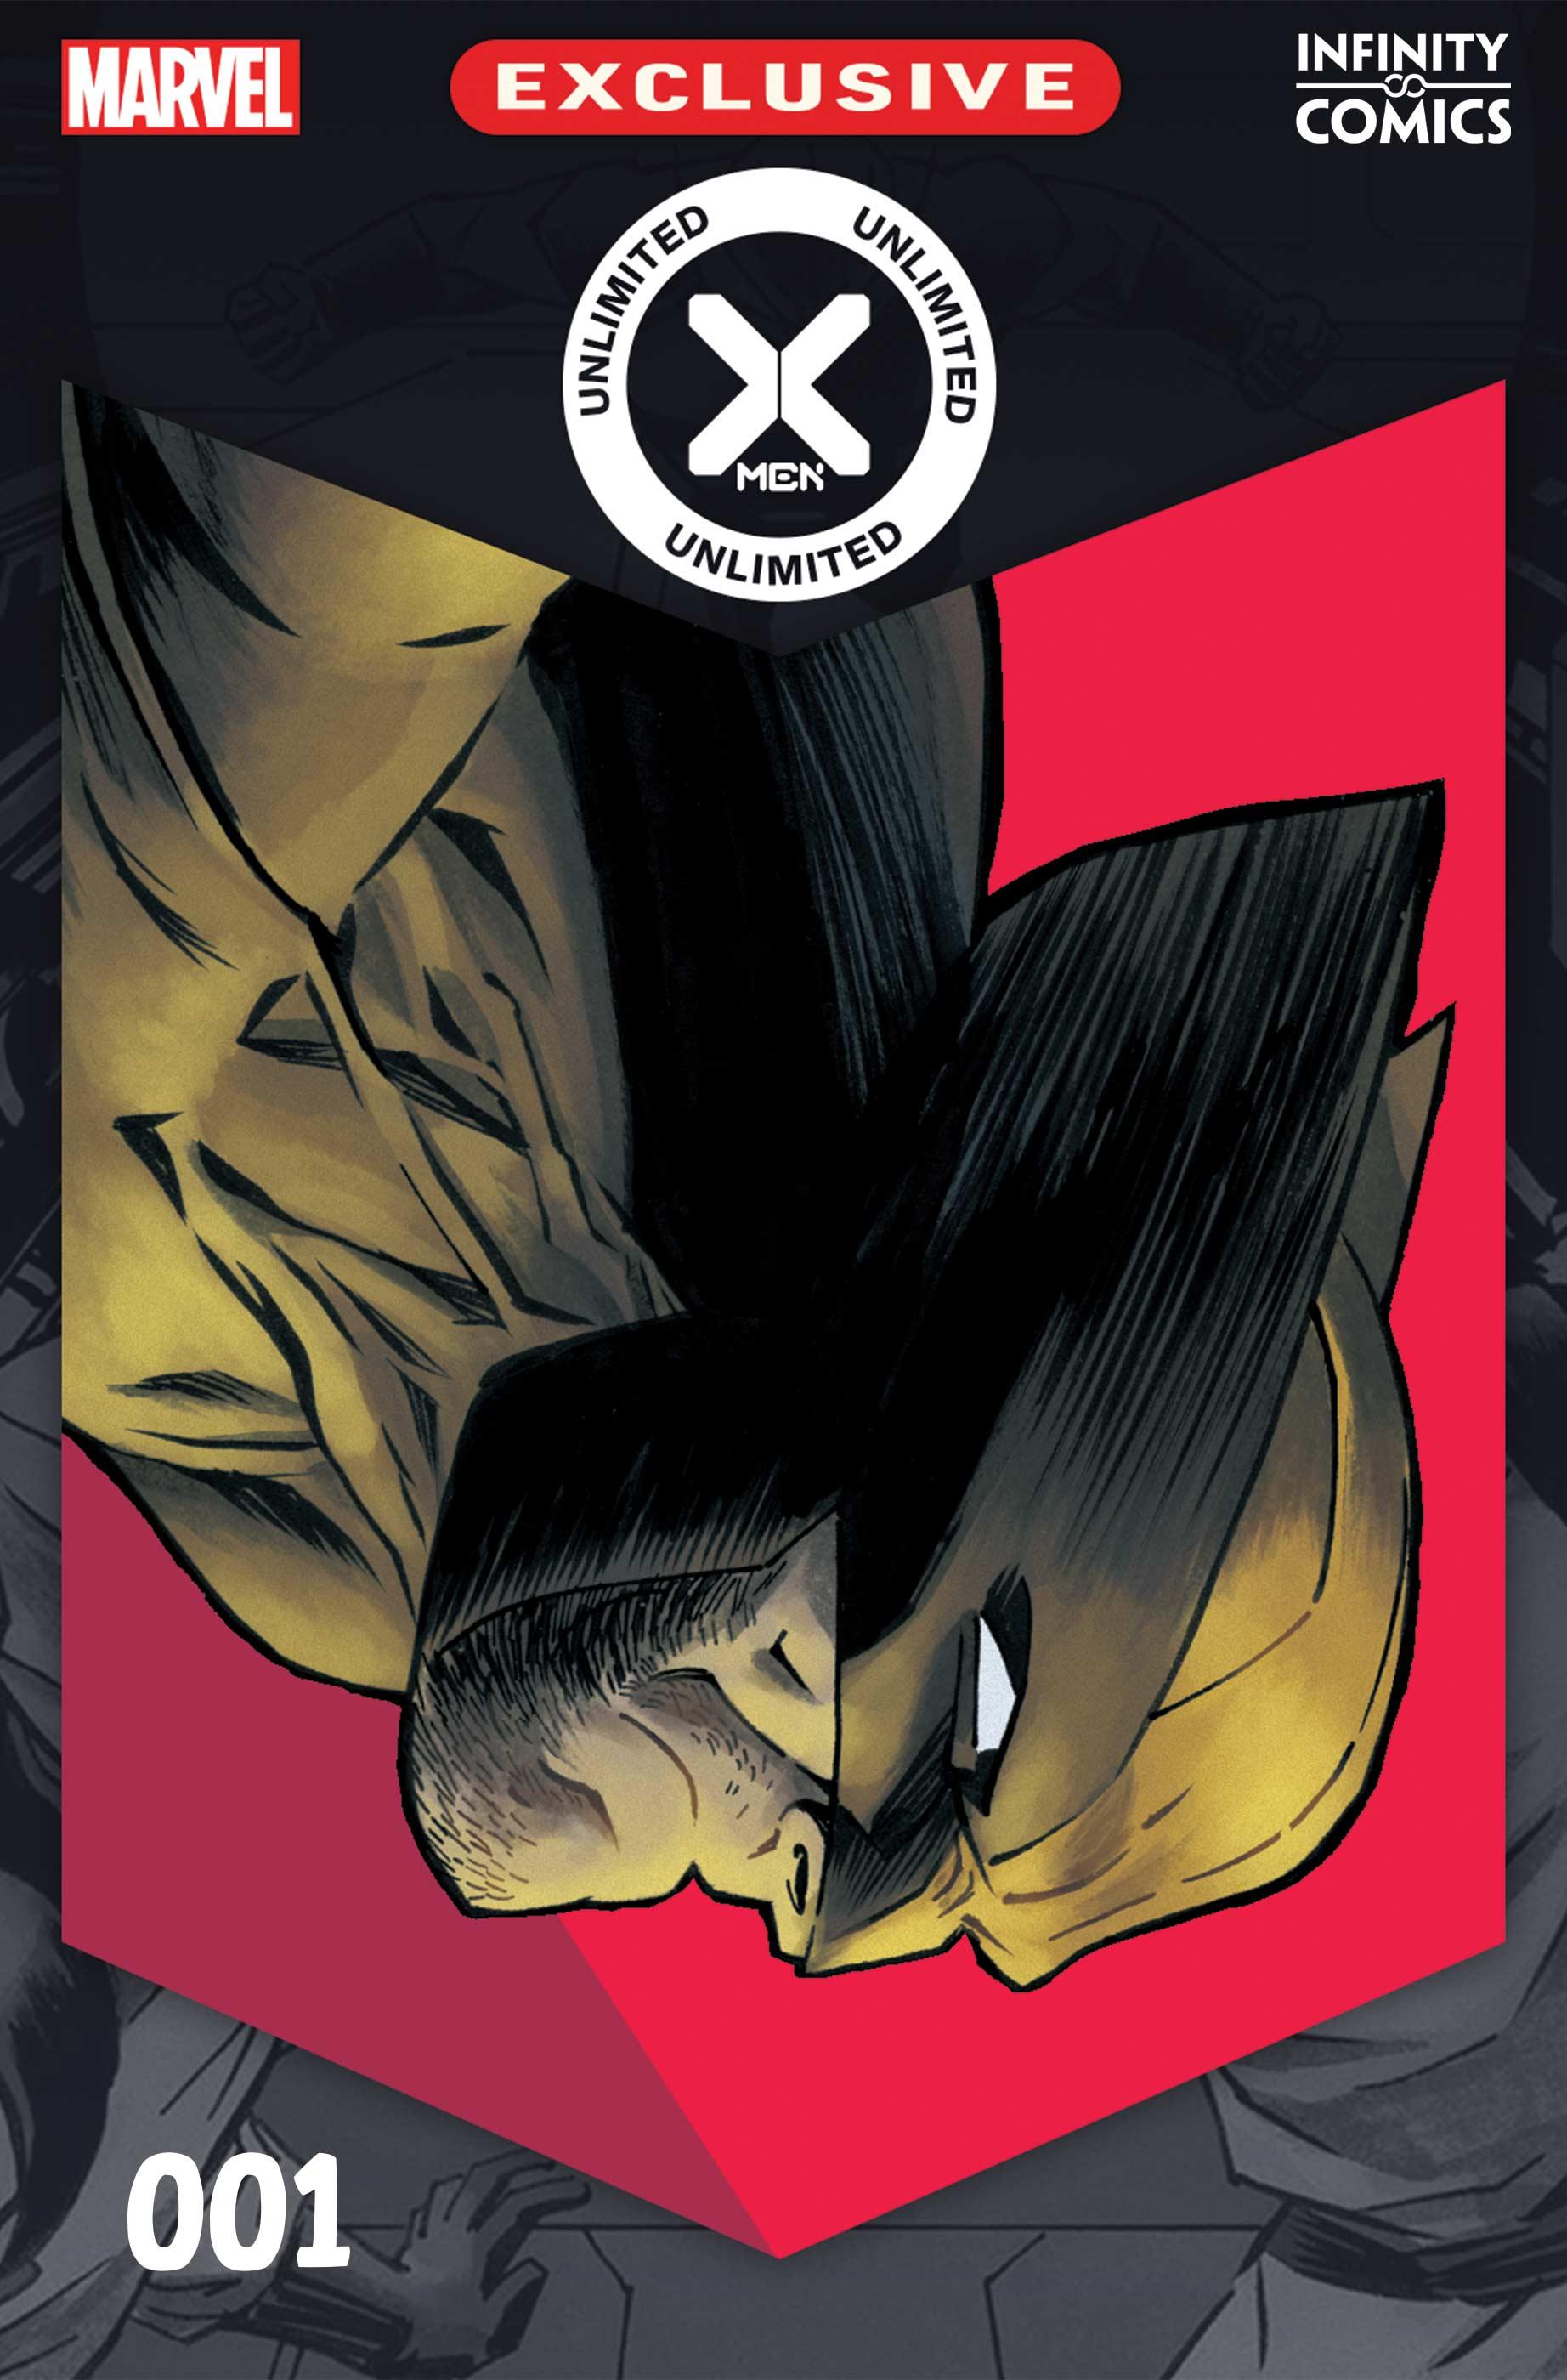 X-Men Unlimited Infinity Comic (2021) #1